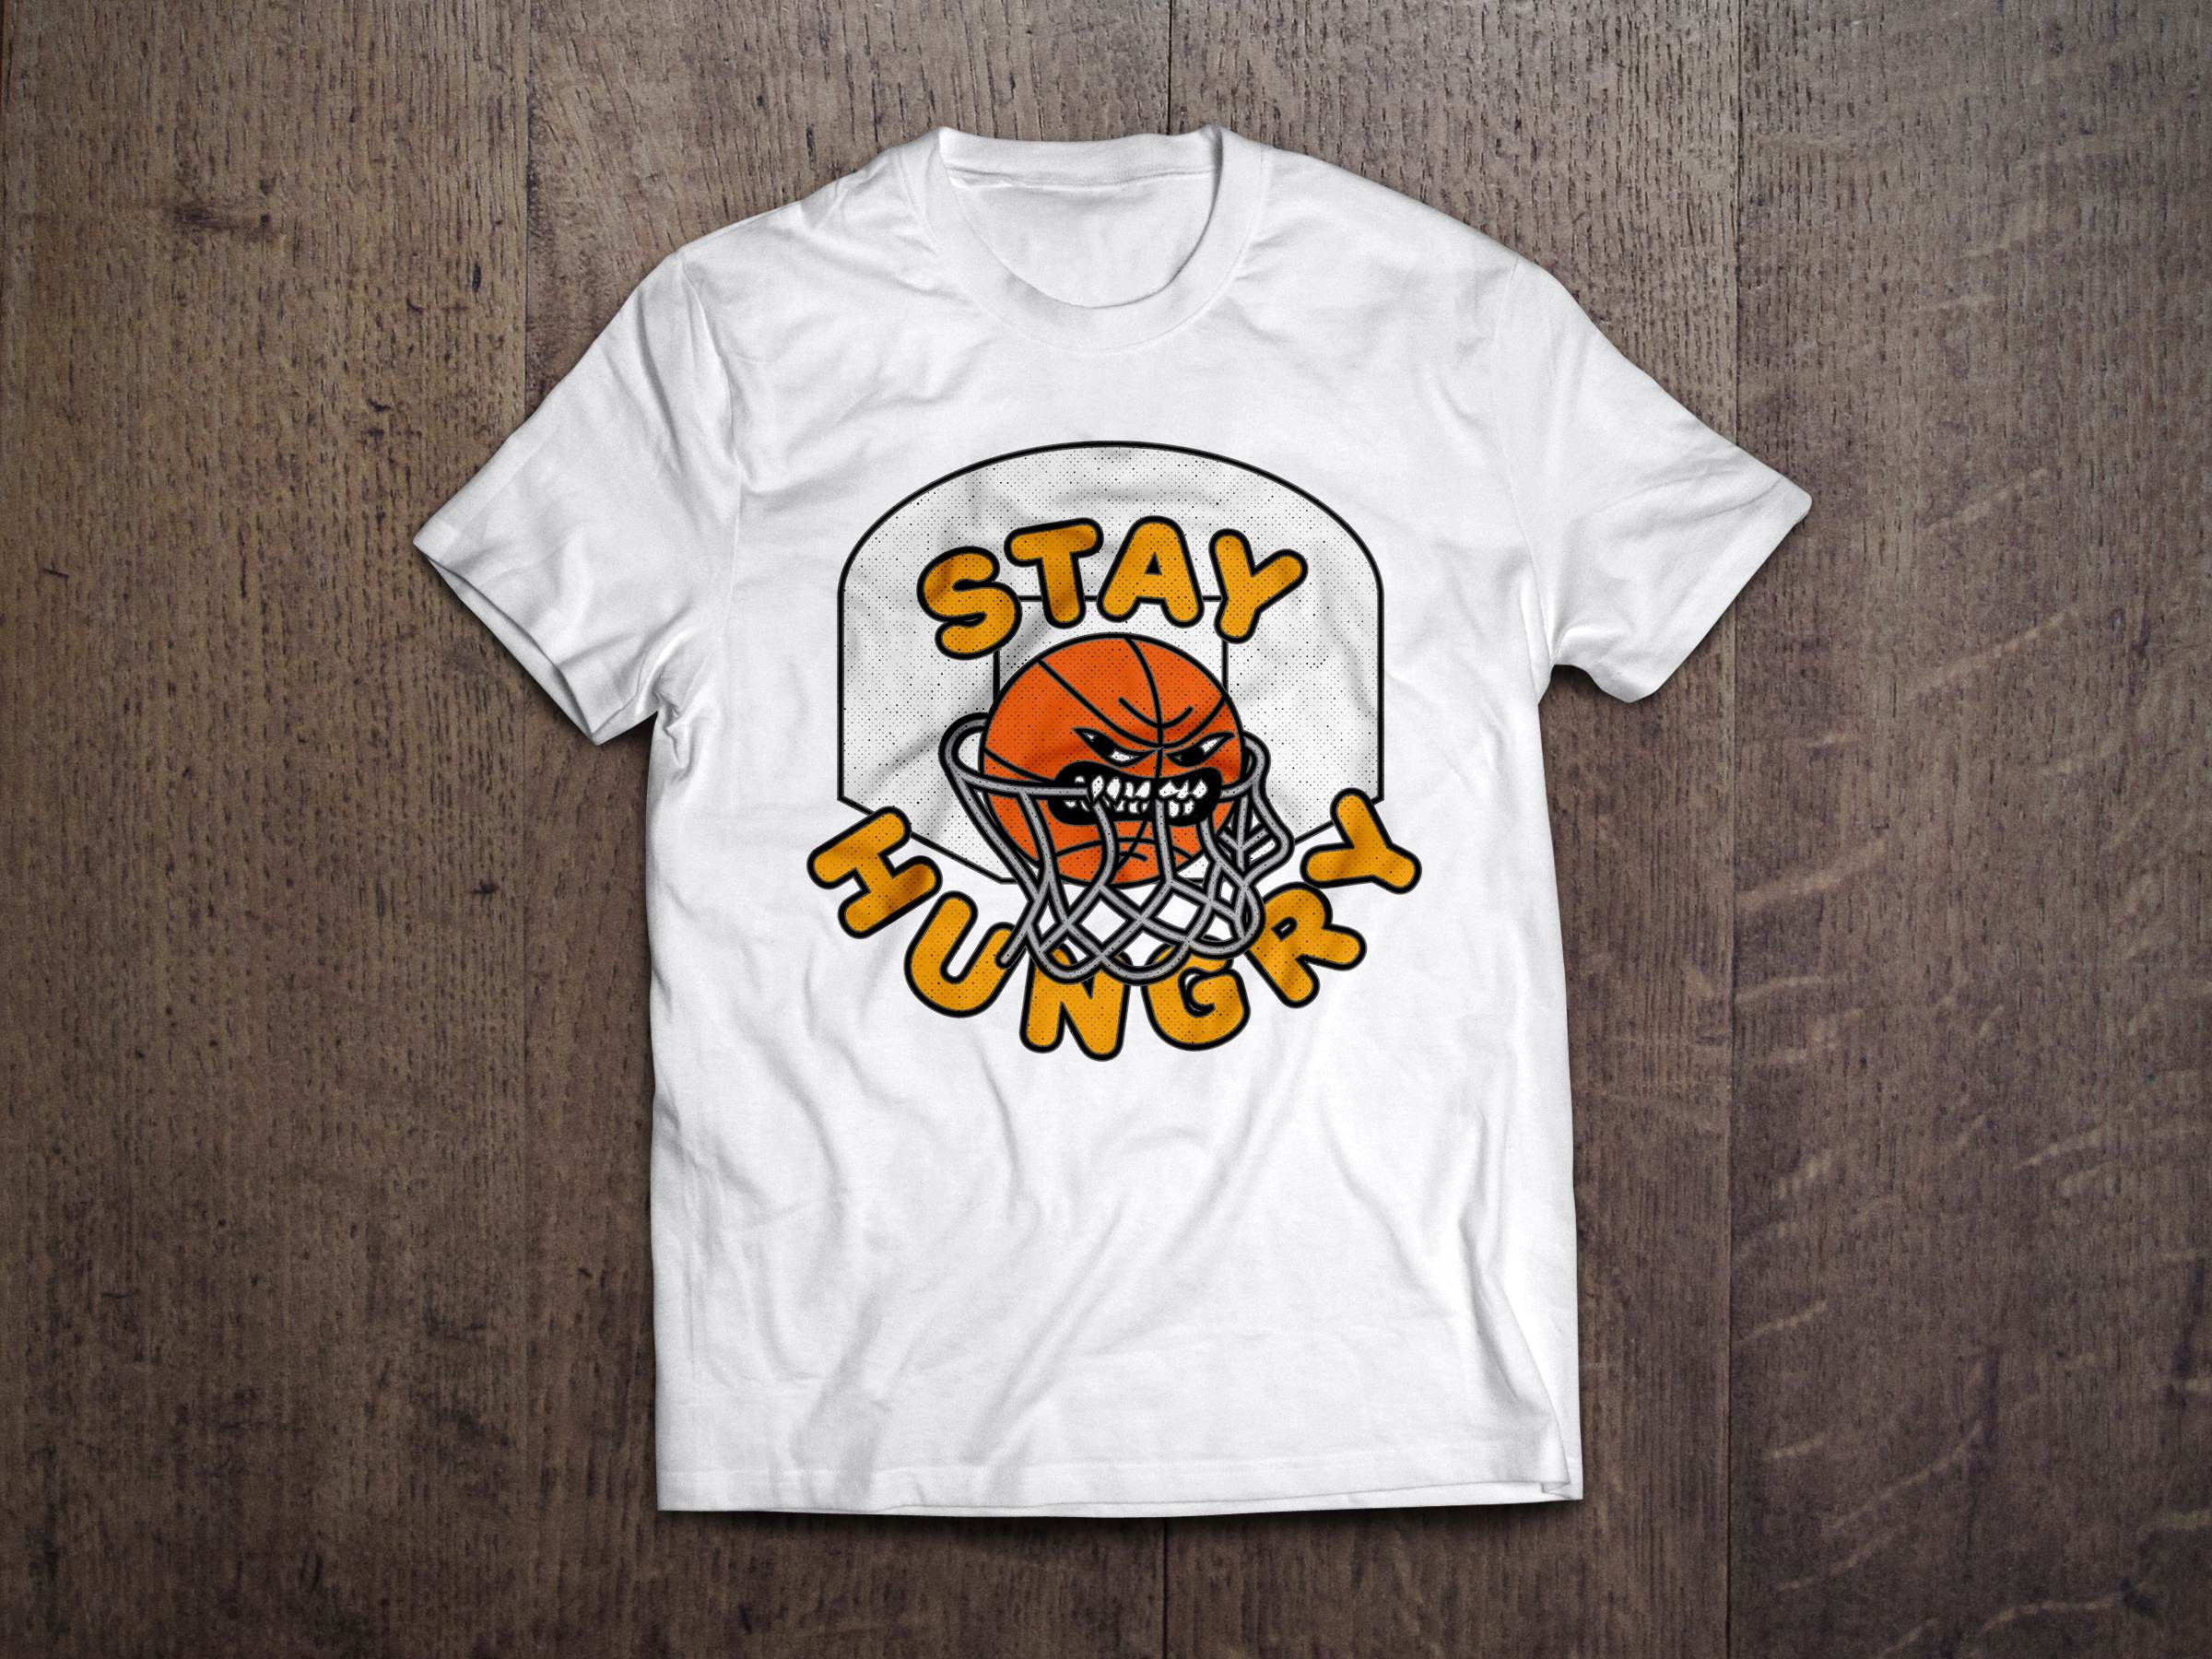 StayHungryTShirtDesignWhite.jpg